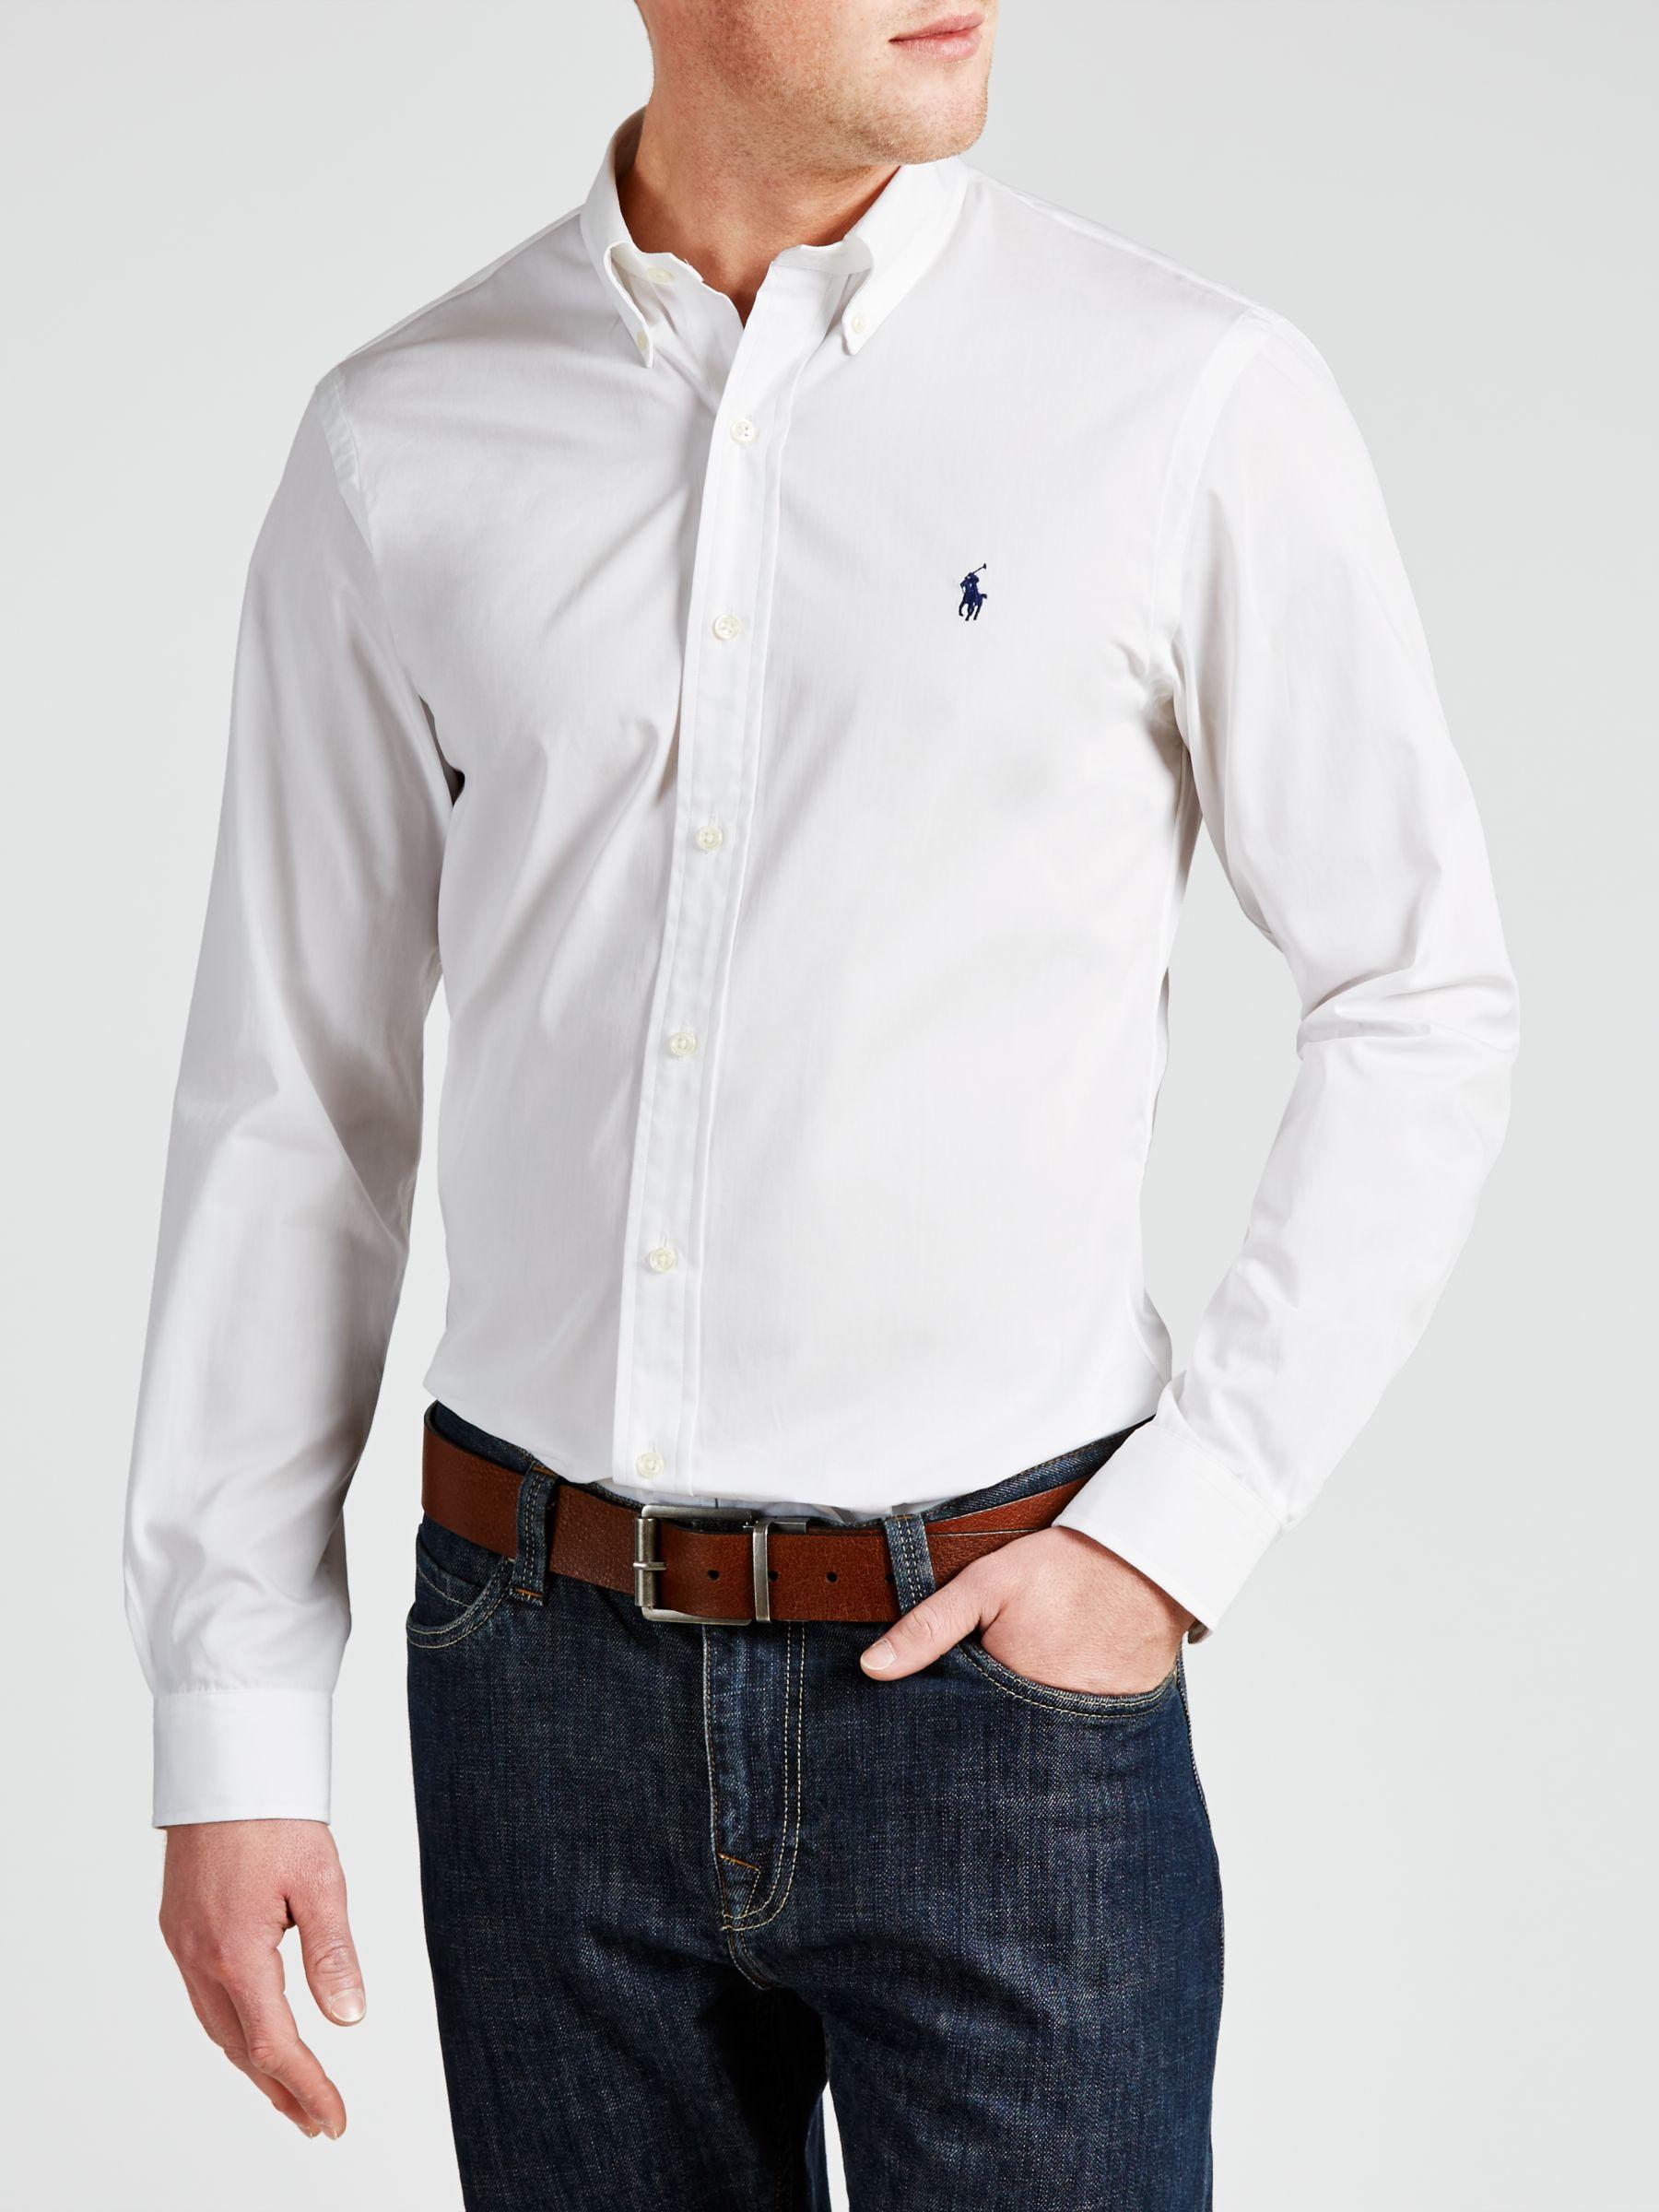 ralph lauren white cotton shirt